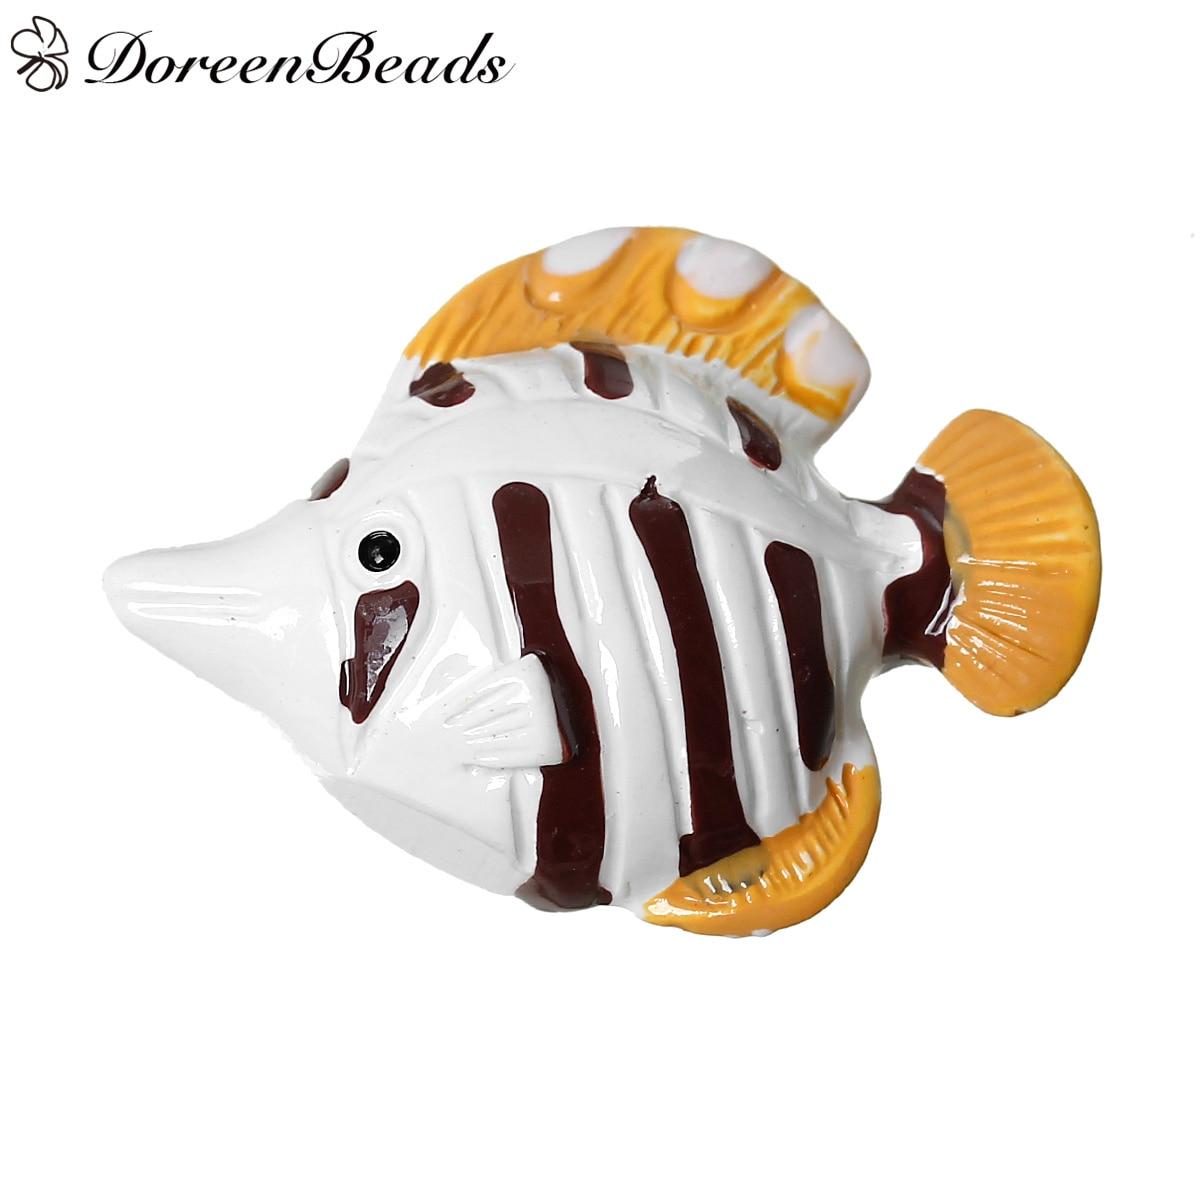 DoreenBeads Resin Cabochon Embellishments Findings Fish White 28.0mm <font><b>x</b></font> 21.0mm, 10 PCs